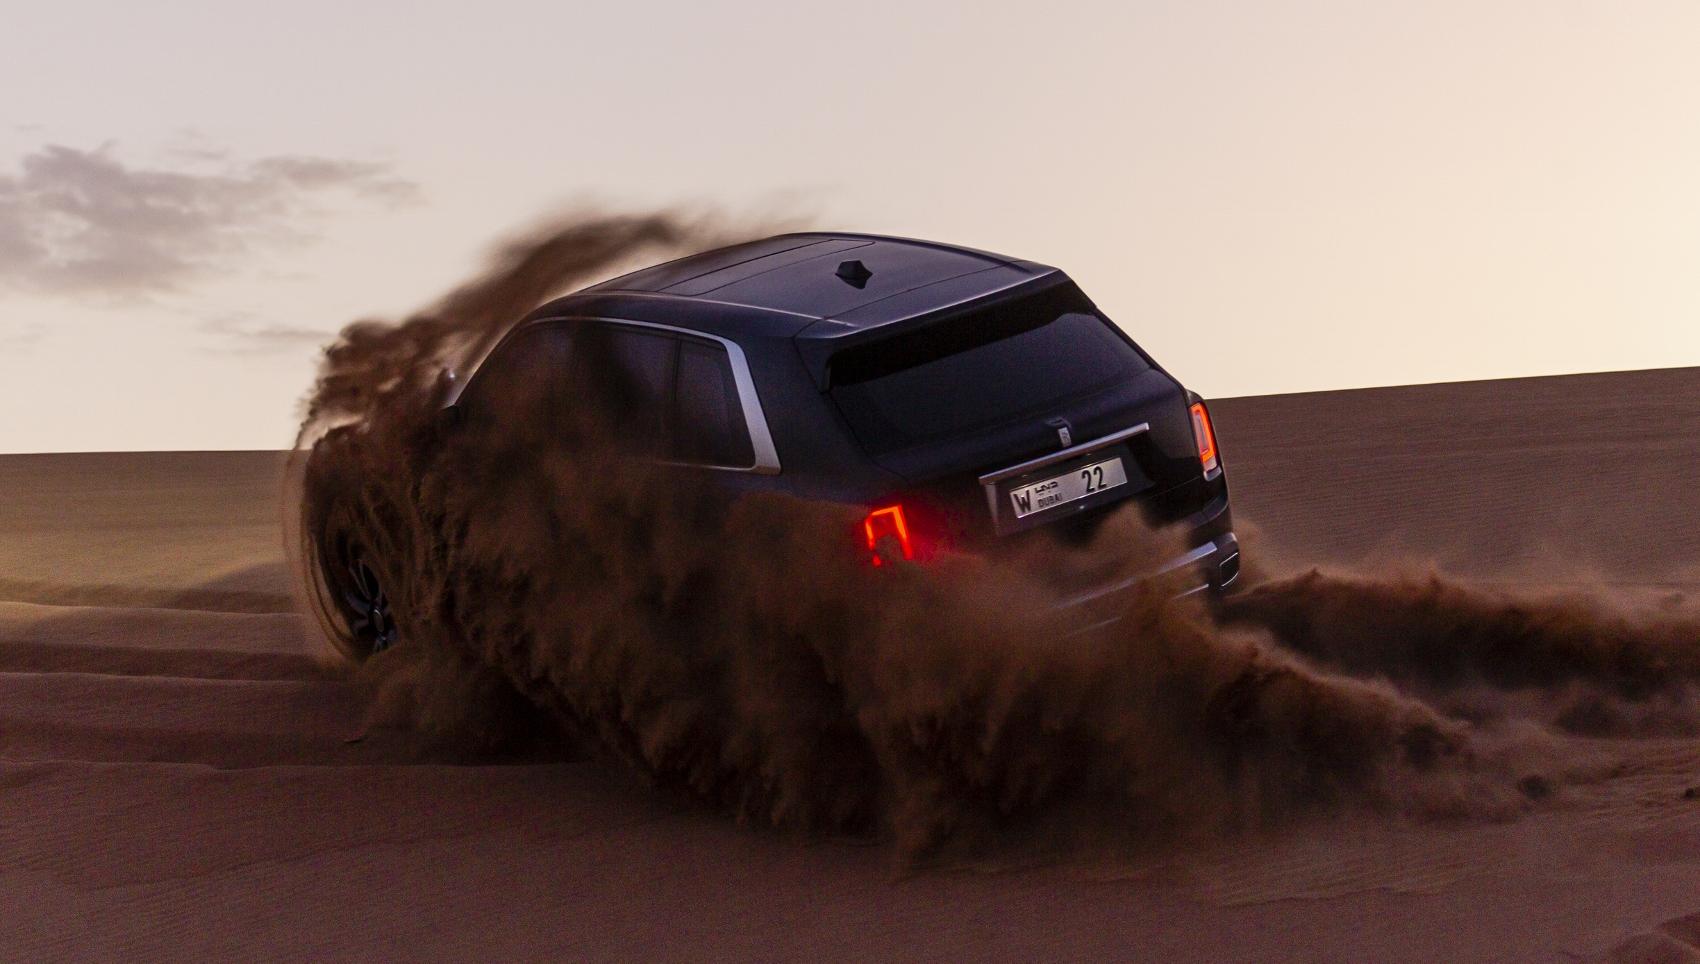 Rolls Royce Cullinan sa predviedol na púšti. Pozrite si foto aj video upx8P24HLd rolls-royce-cullina